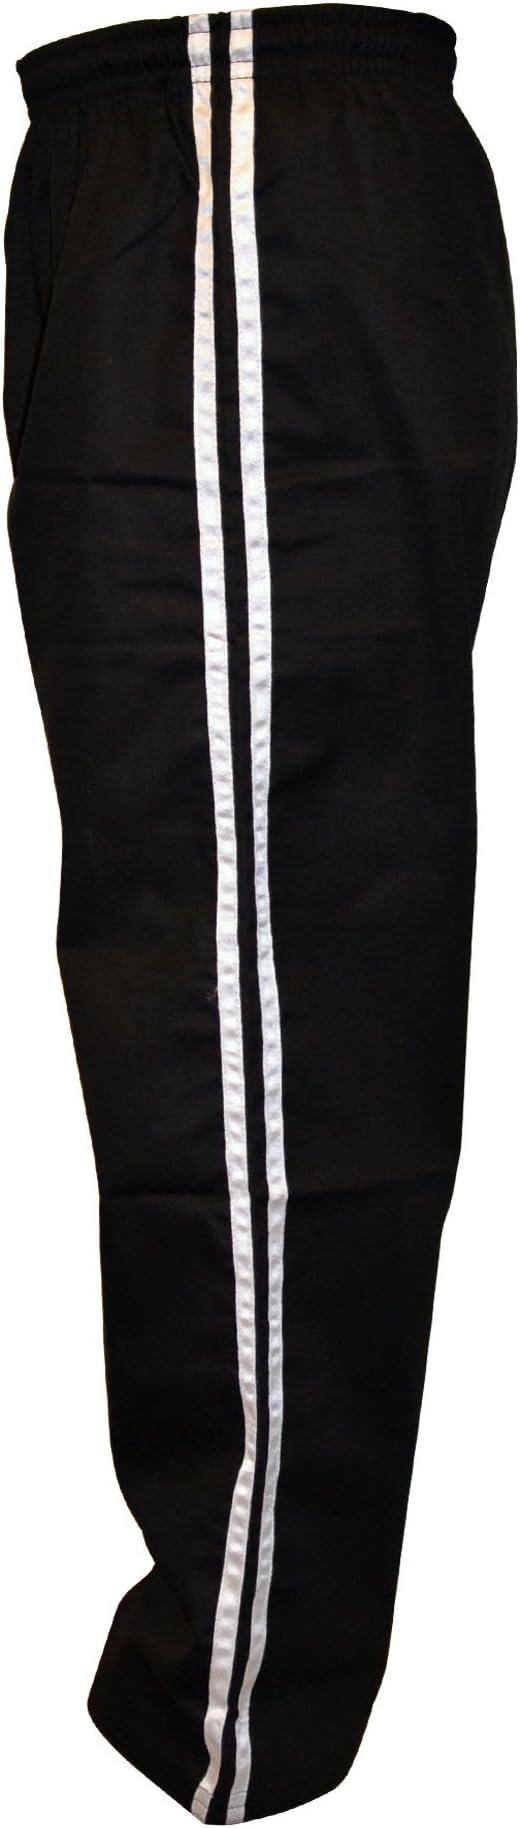 TurnerMAX Karate Pantaloni Neri con Striscia Gialla